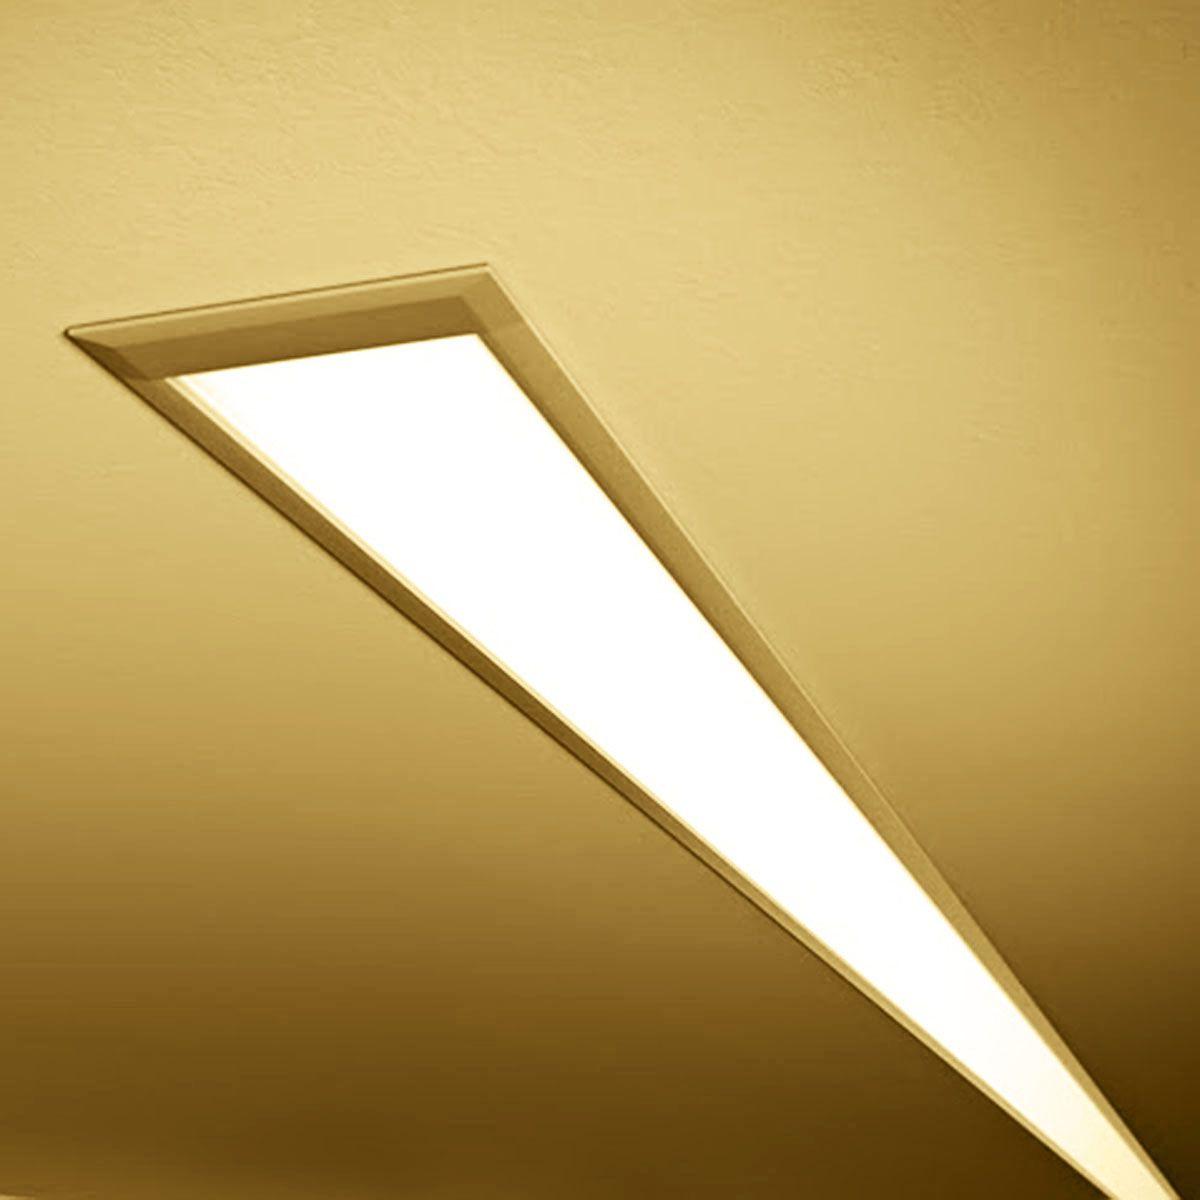 24V Aluminium LED Einbauleuchte – warmweiß – linear – diffuse Abdeckung